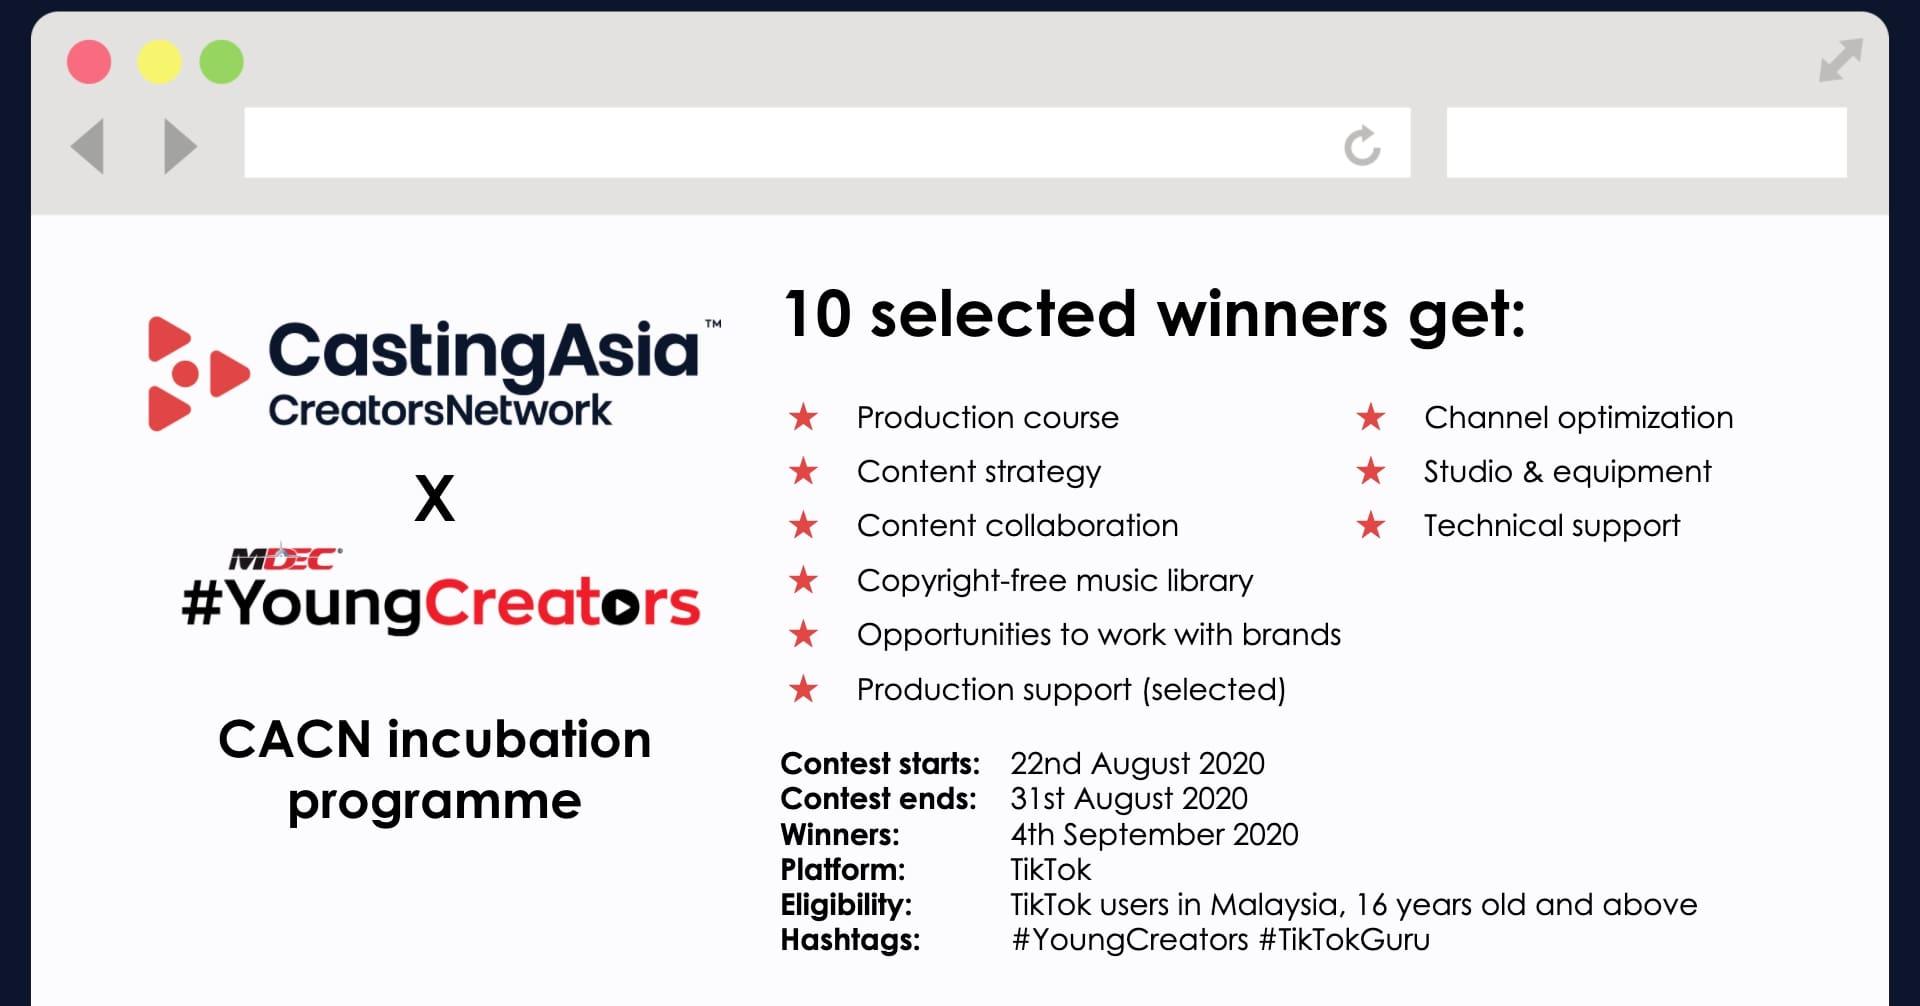 CastingAsia hashtag analytics feature